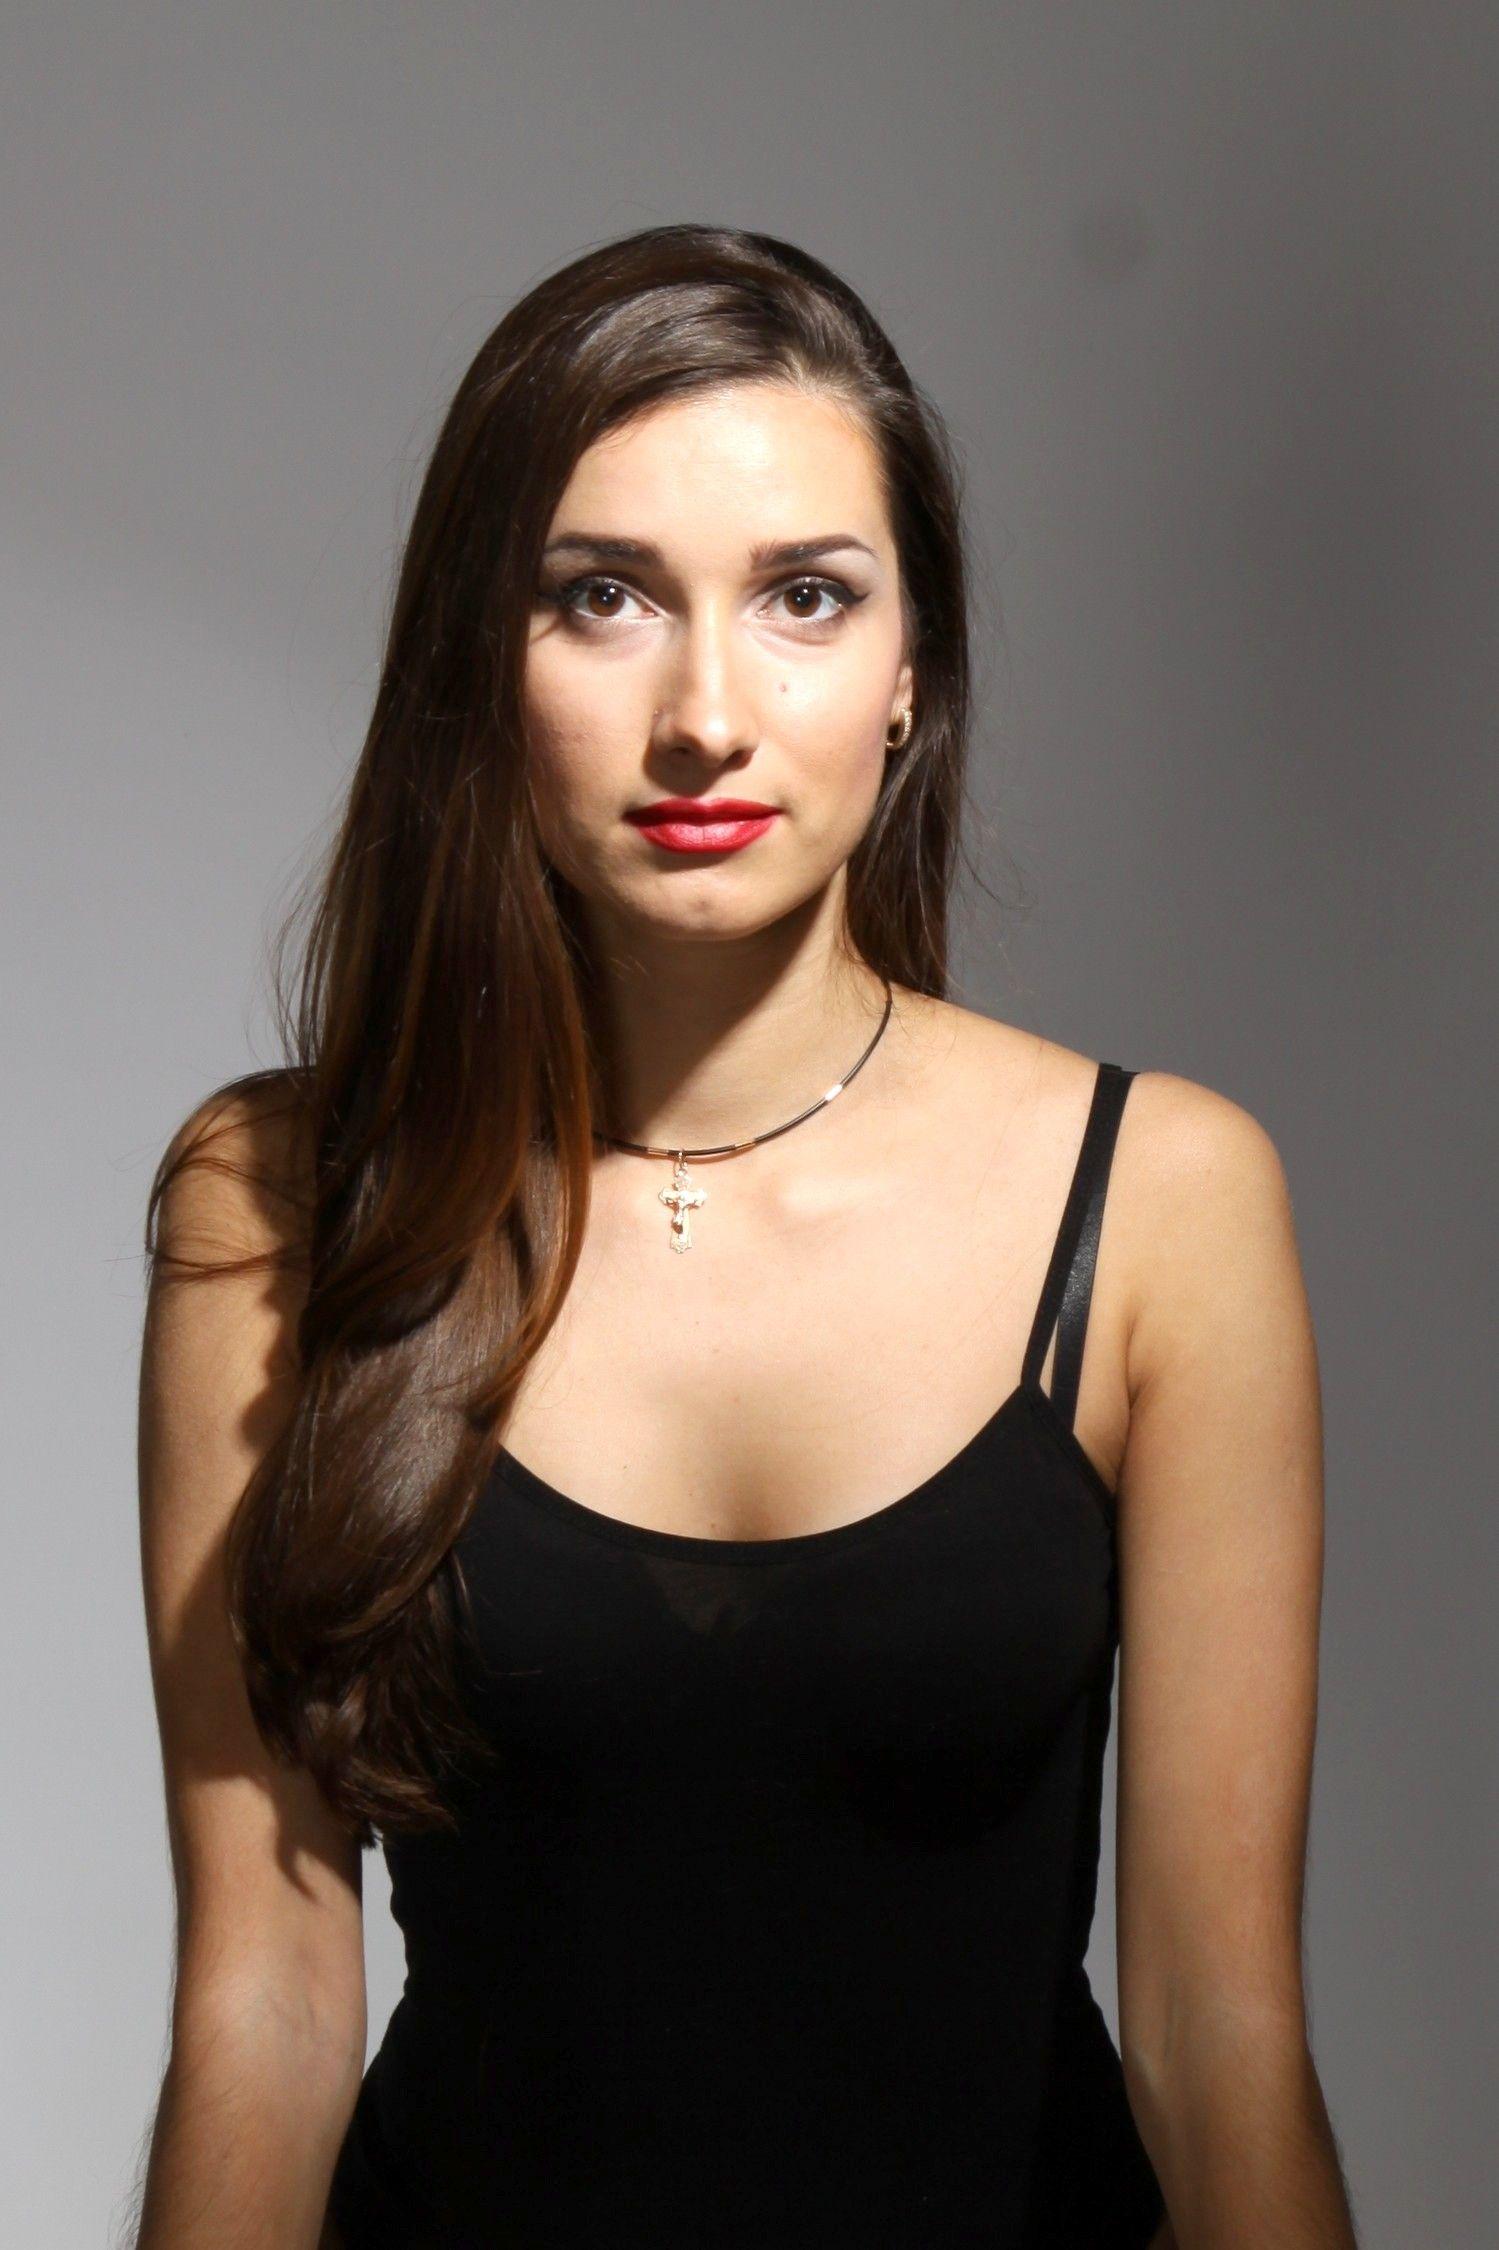 Haiducii Nude knjige za mlade online dating pron videos - 19216811login.co